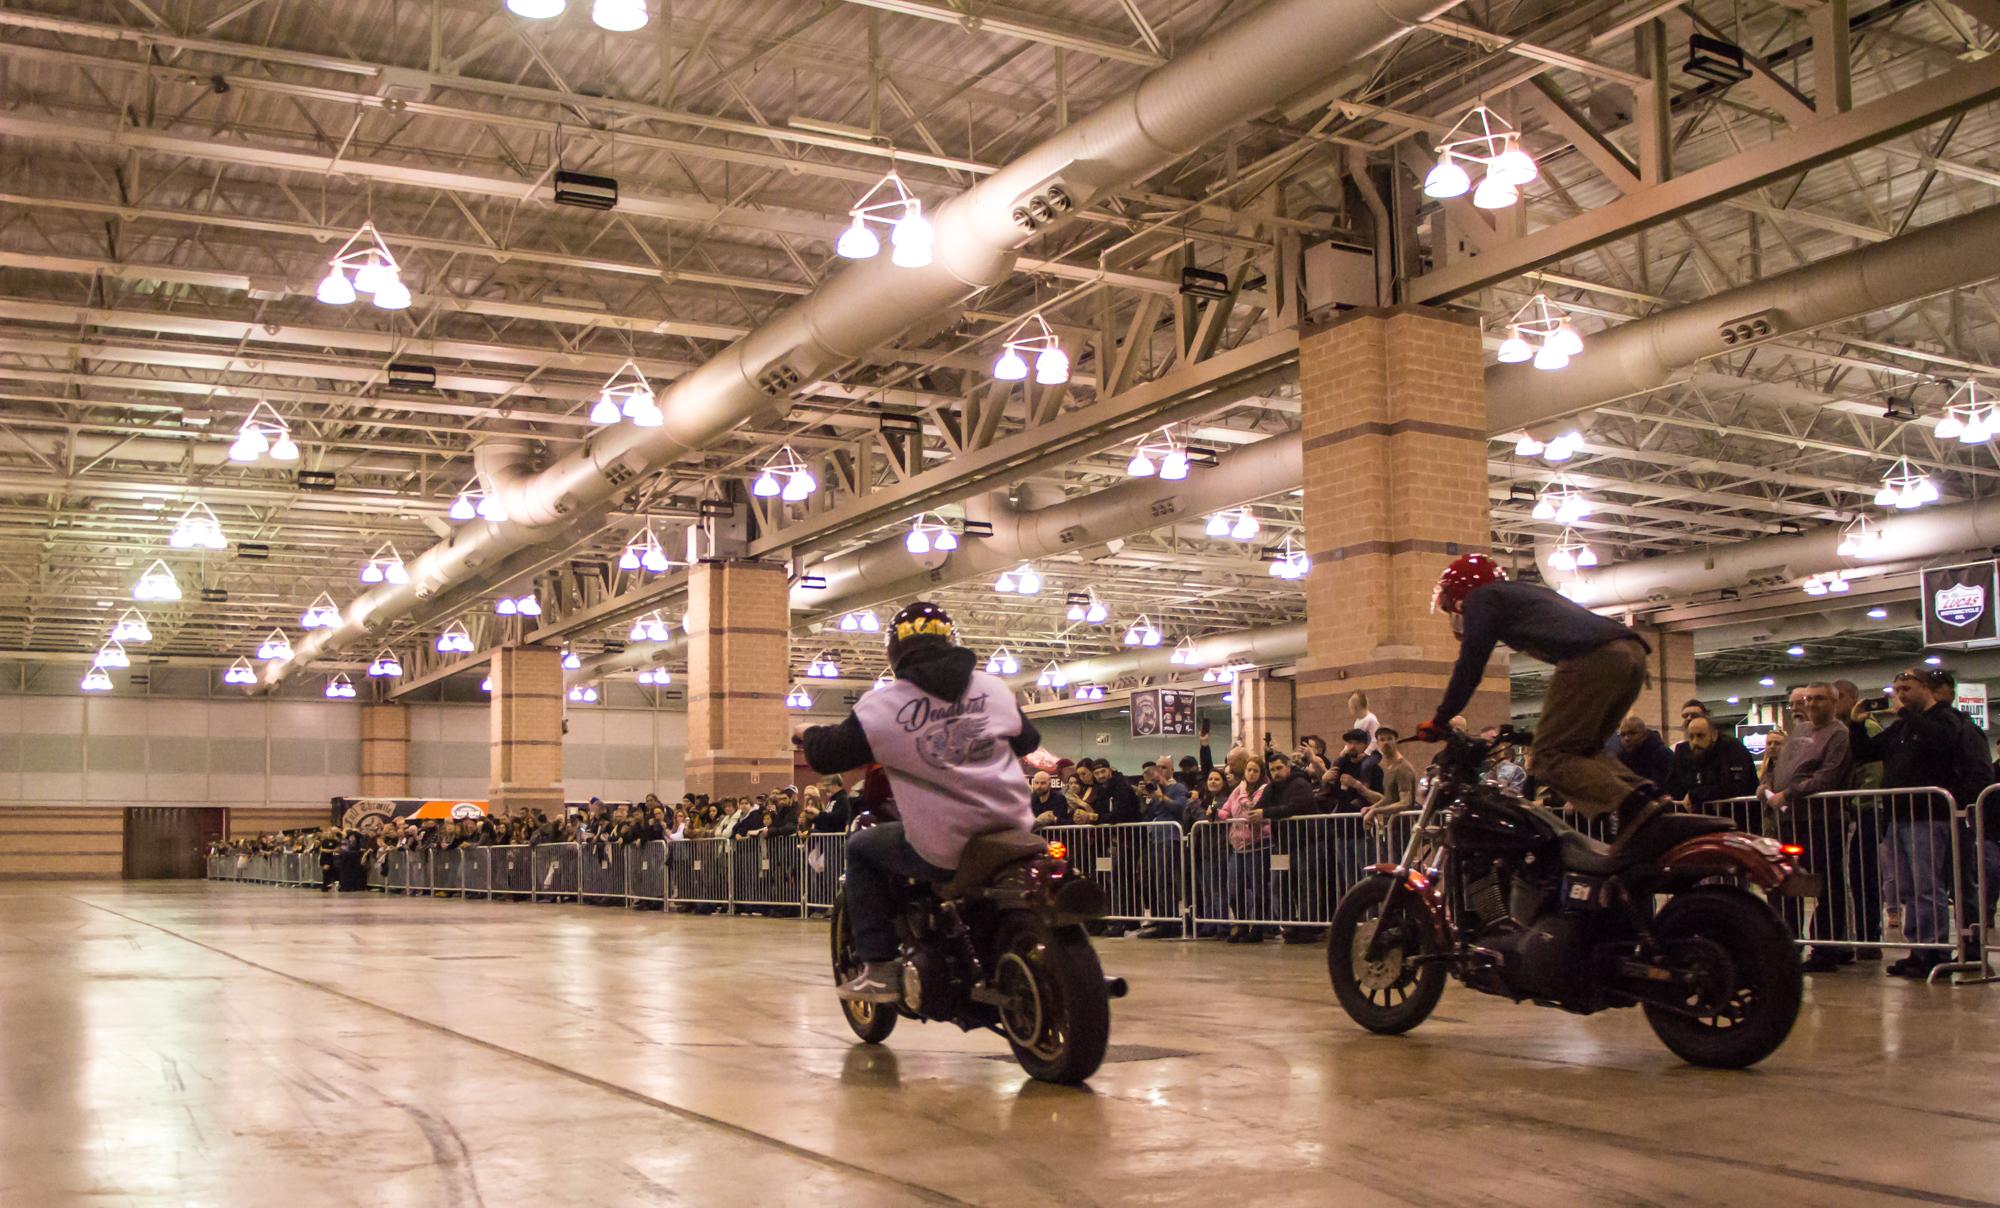 Easyriders Show Atlantic City NJ Deadbeat Customs Blog - Atlantic city car show 2018